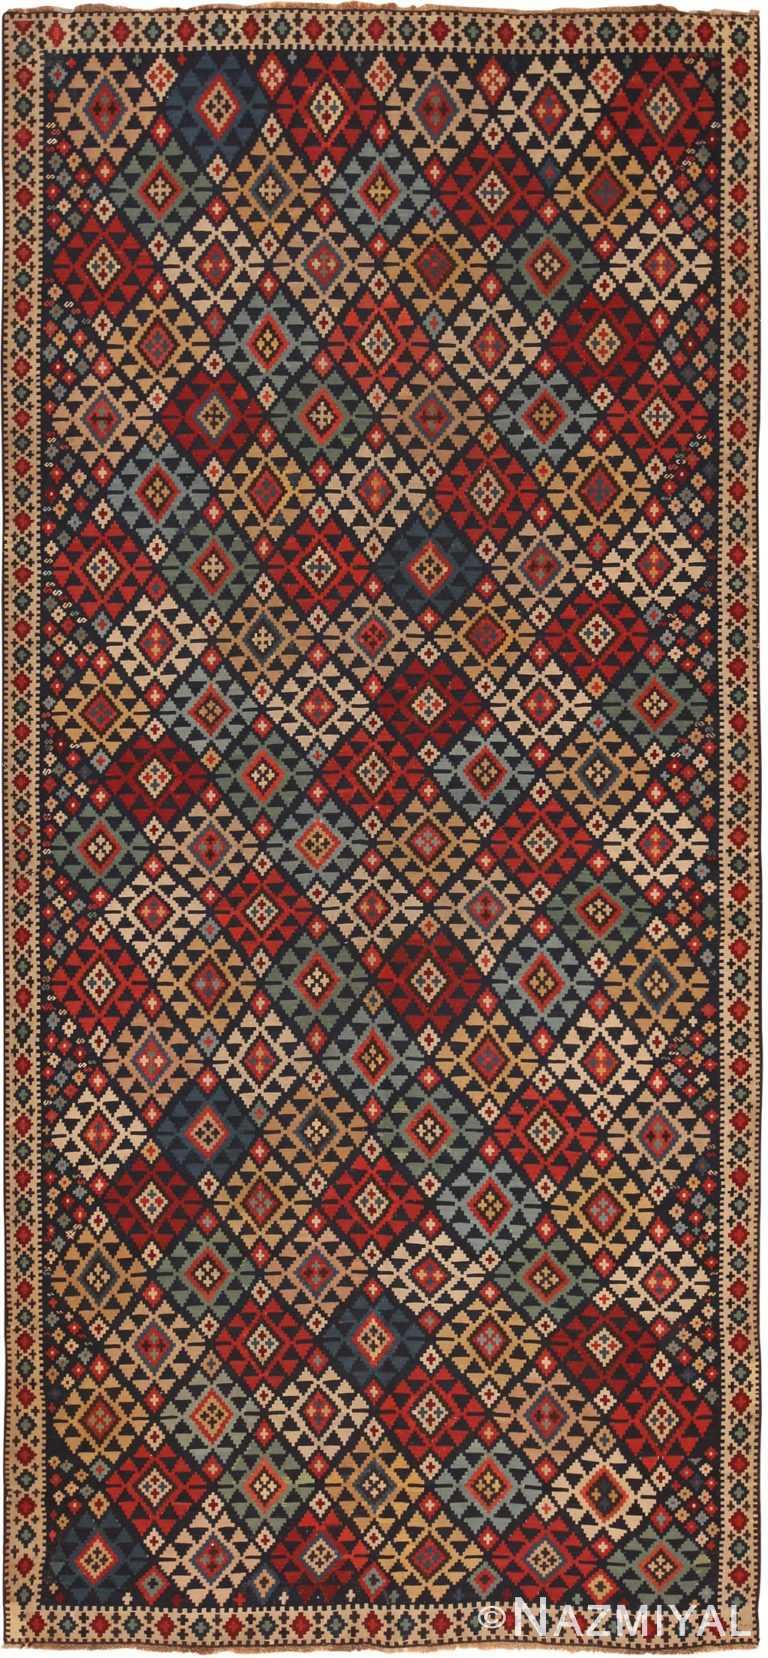 Antique Tribal Caucasian Shirvan Kilim Rug 70418 by Nazmiyal NYC